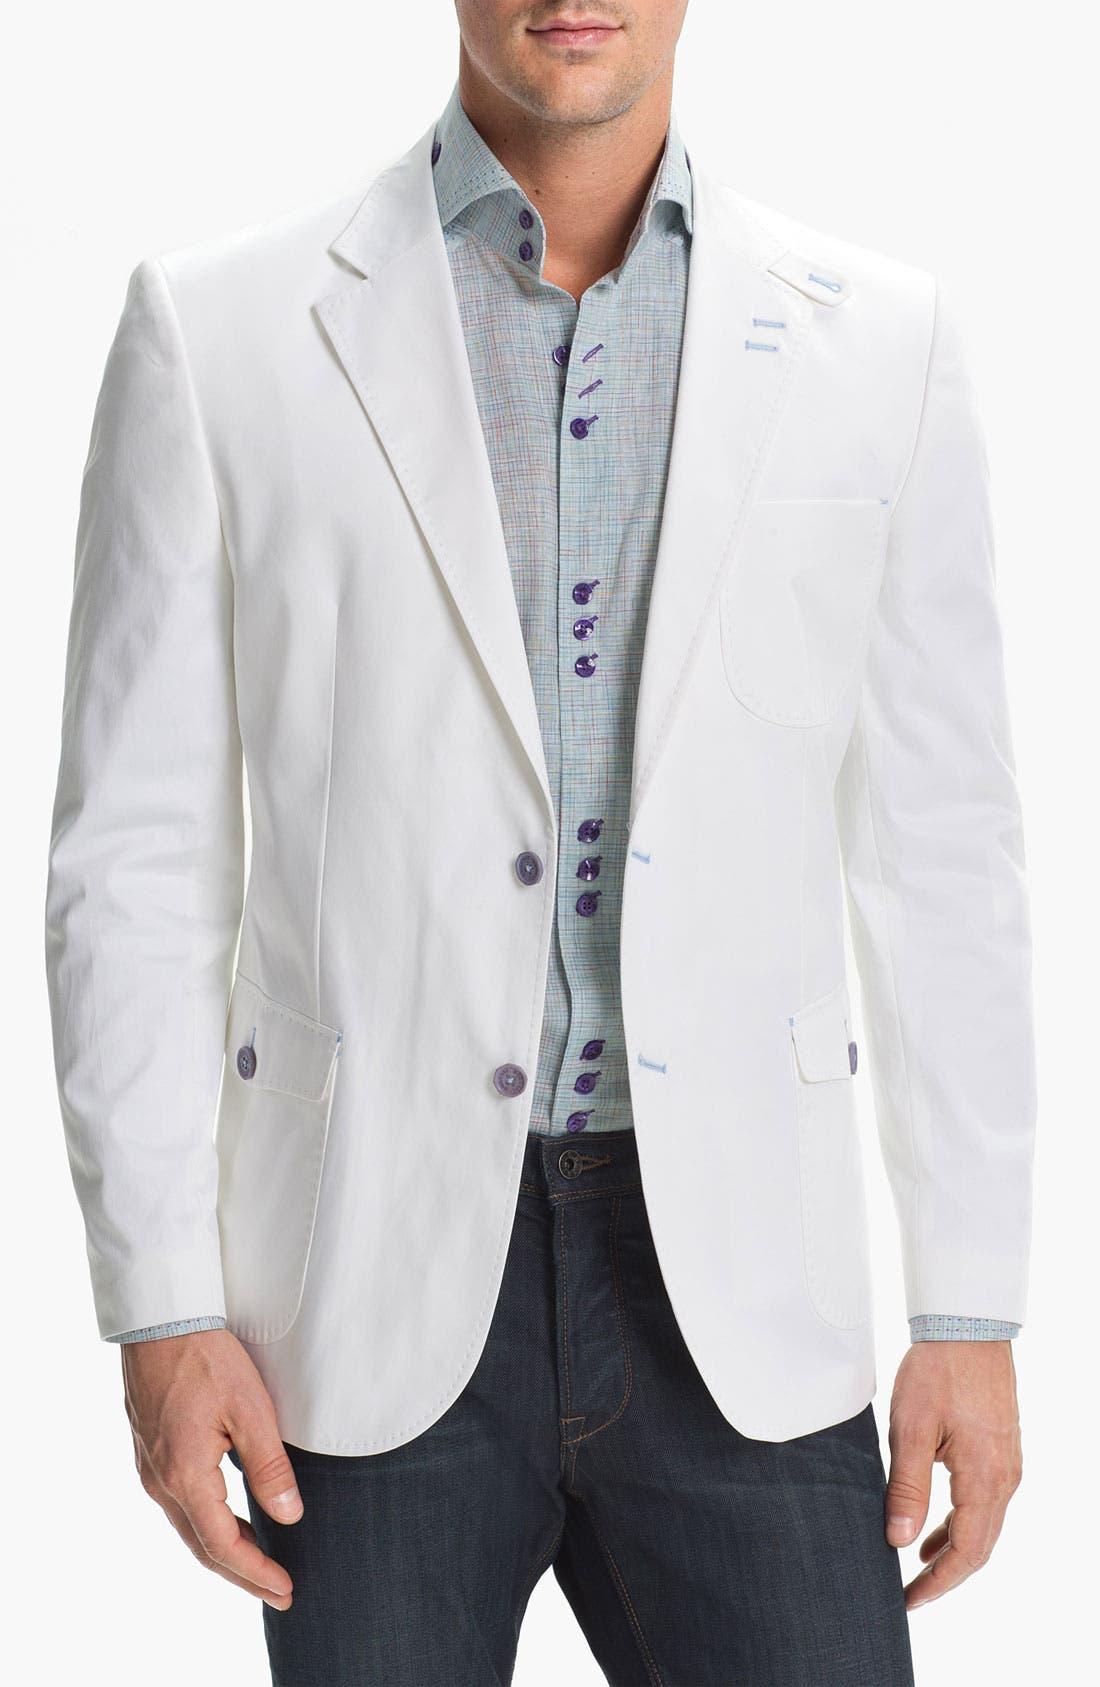 Alternate Image 1 Selected - Bogosse 'Russ 01' Trim Fit Cotton Blazer